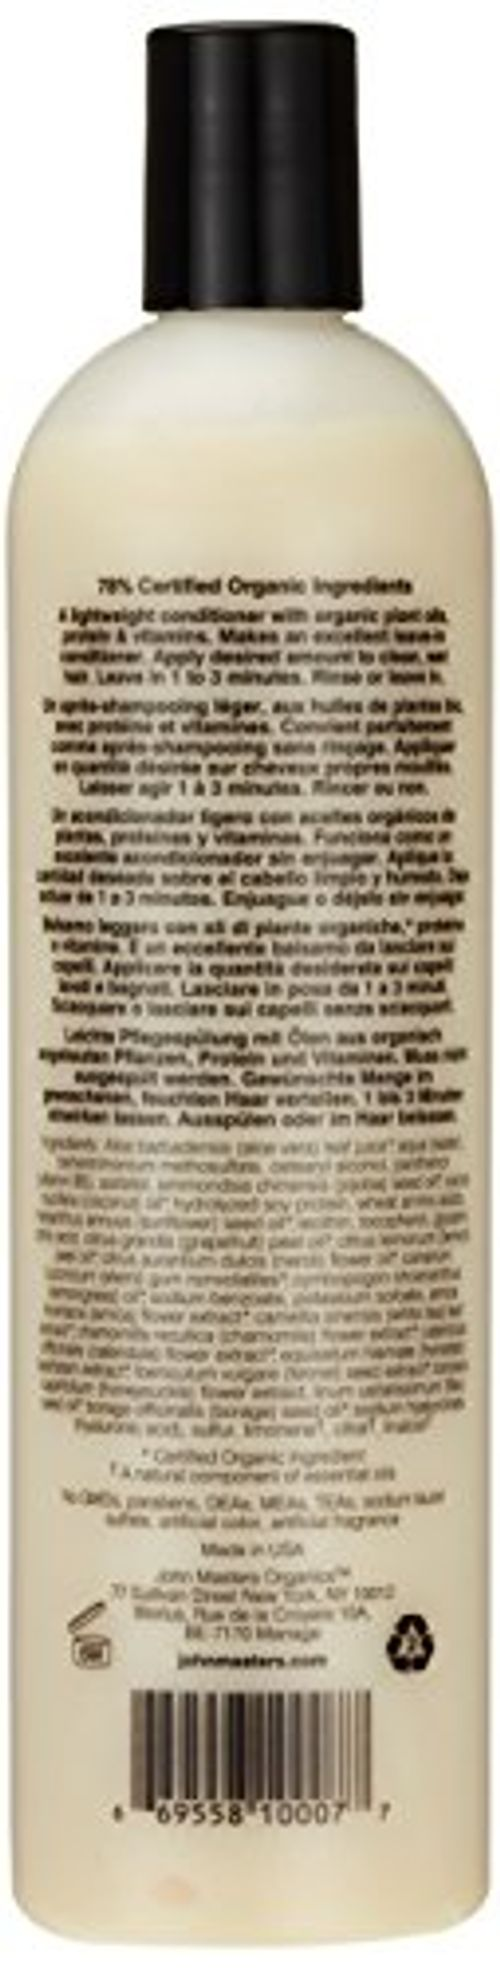 photo Wallpaper of John Masters Organics-John Masters Organics Citrus Y Neroli Desenredante, Acondicionador, 473ml-